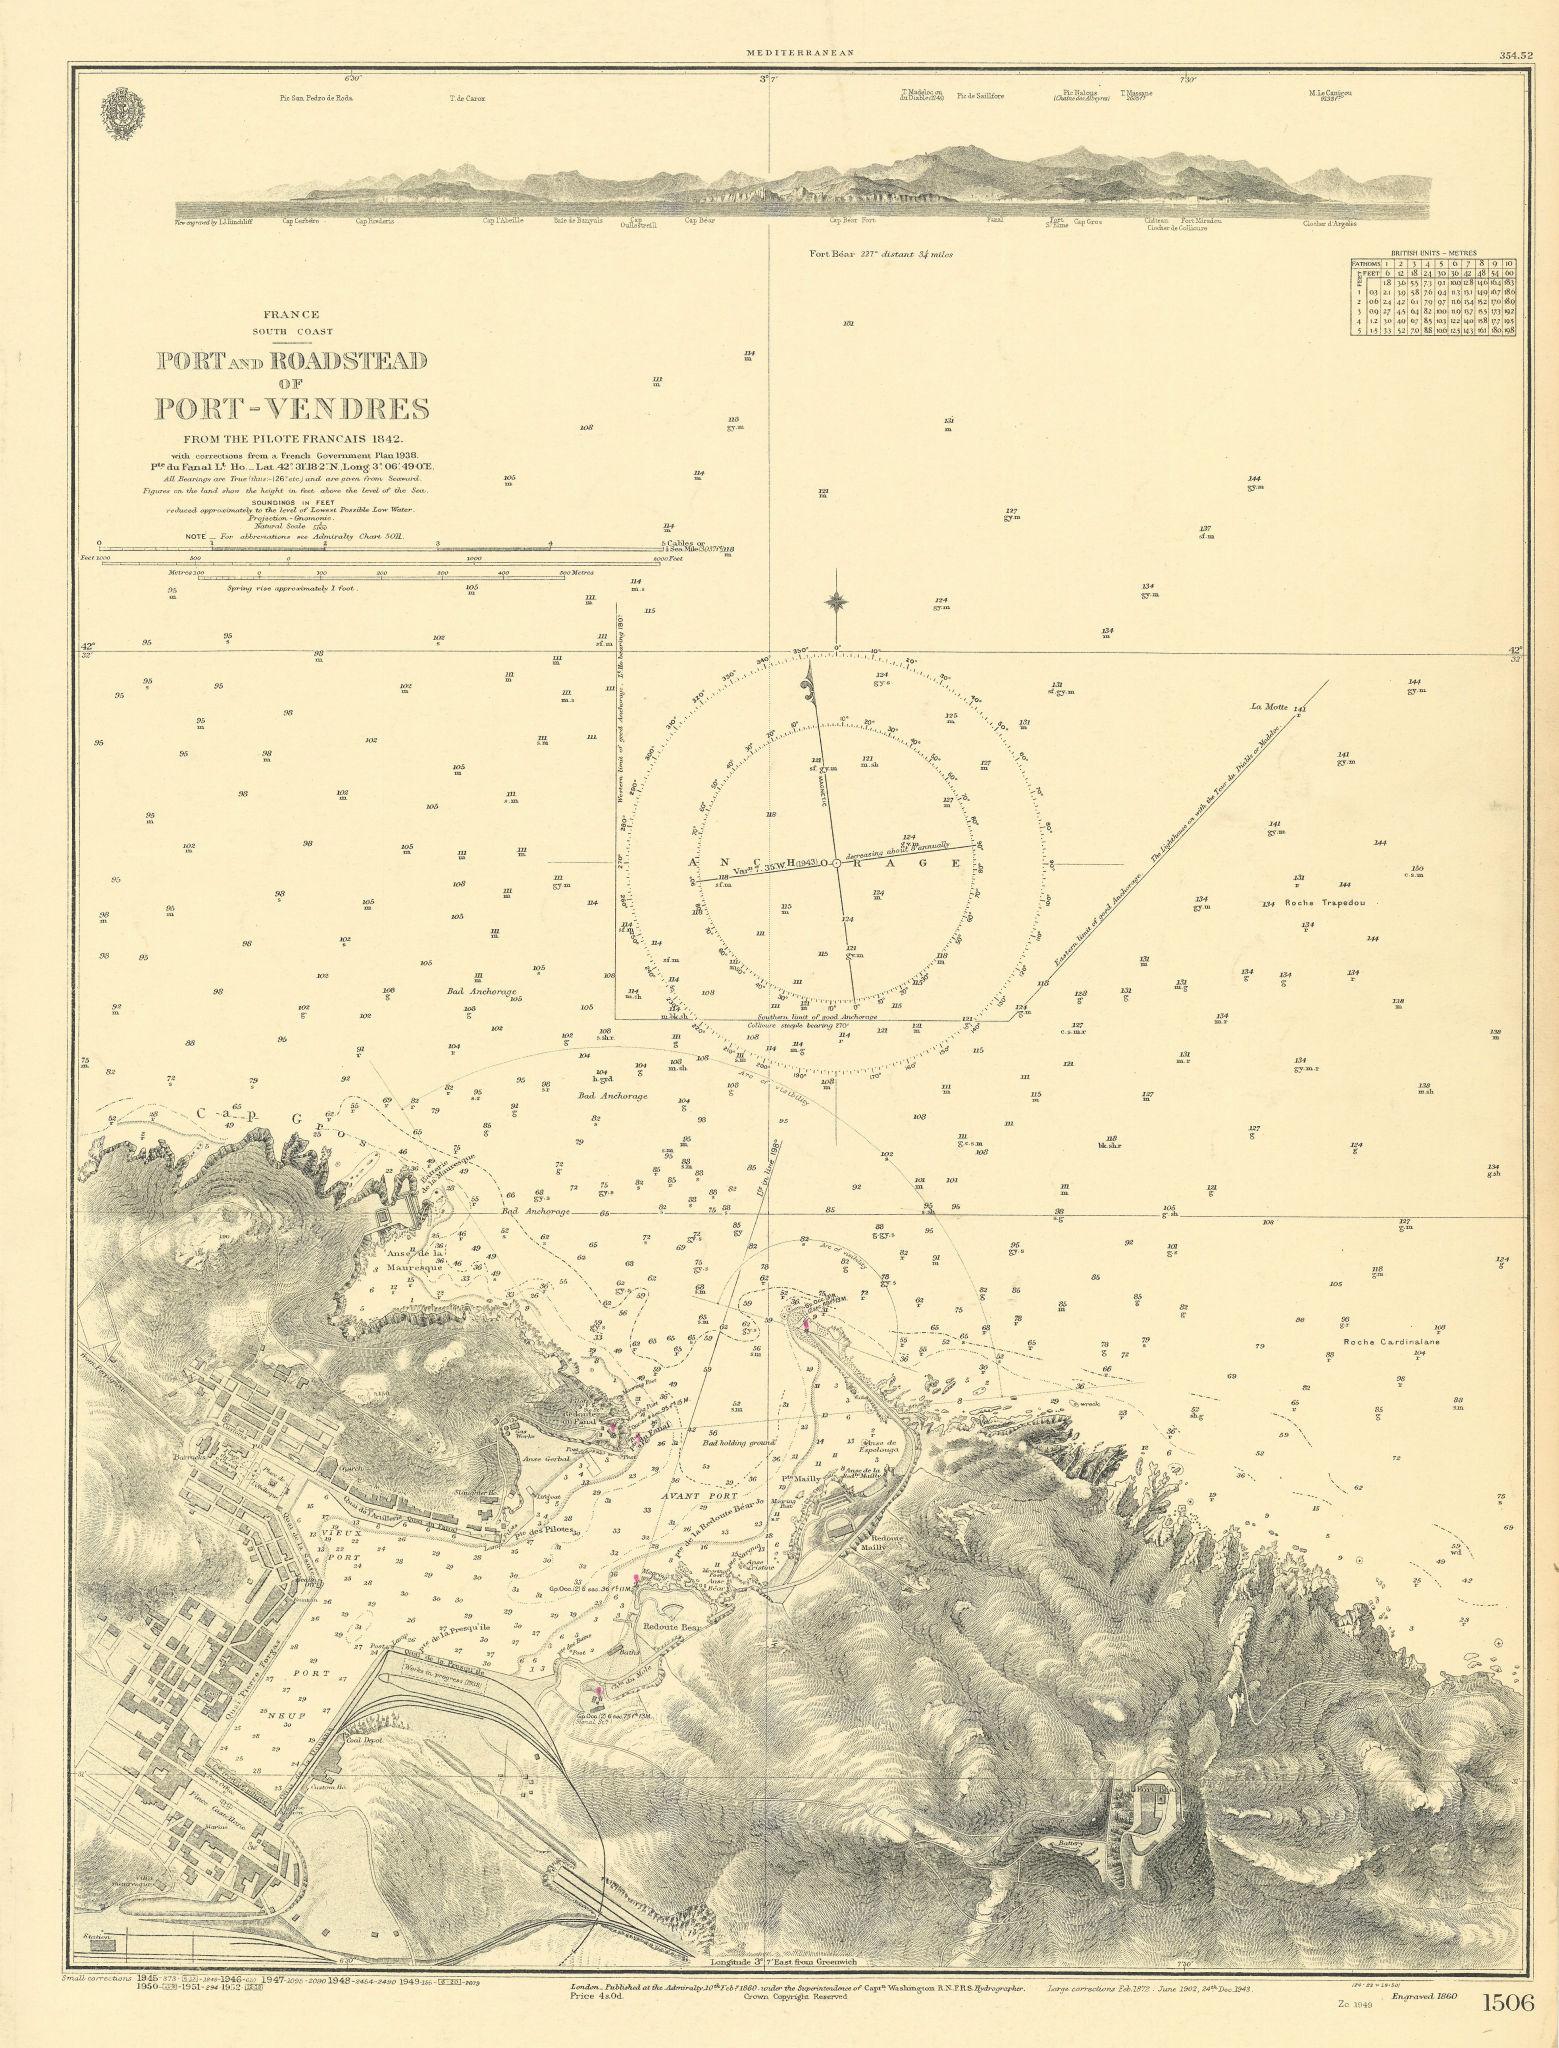 Port-Vendres roadstead. Pyrénées-Orientales. ADMIRALTY sea chart 1860 (1952) map